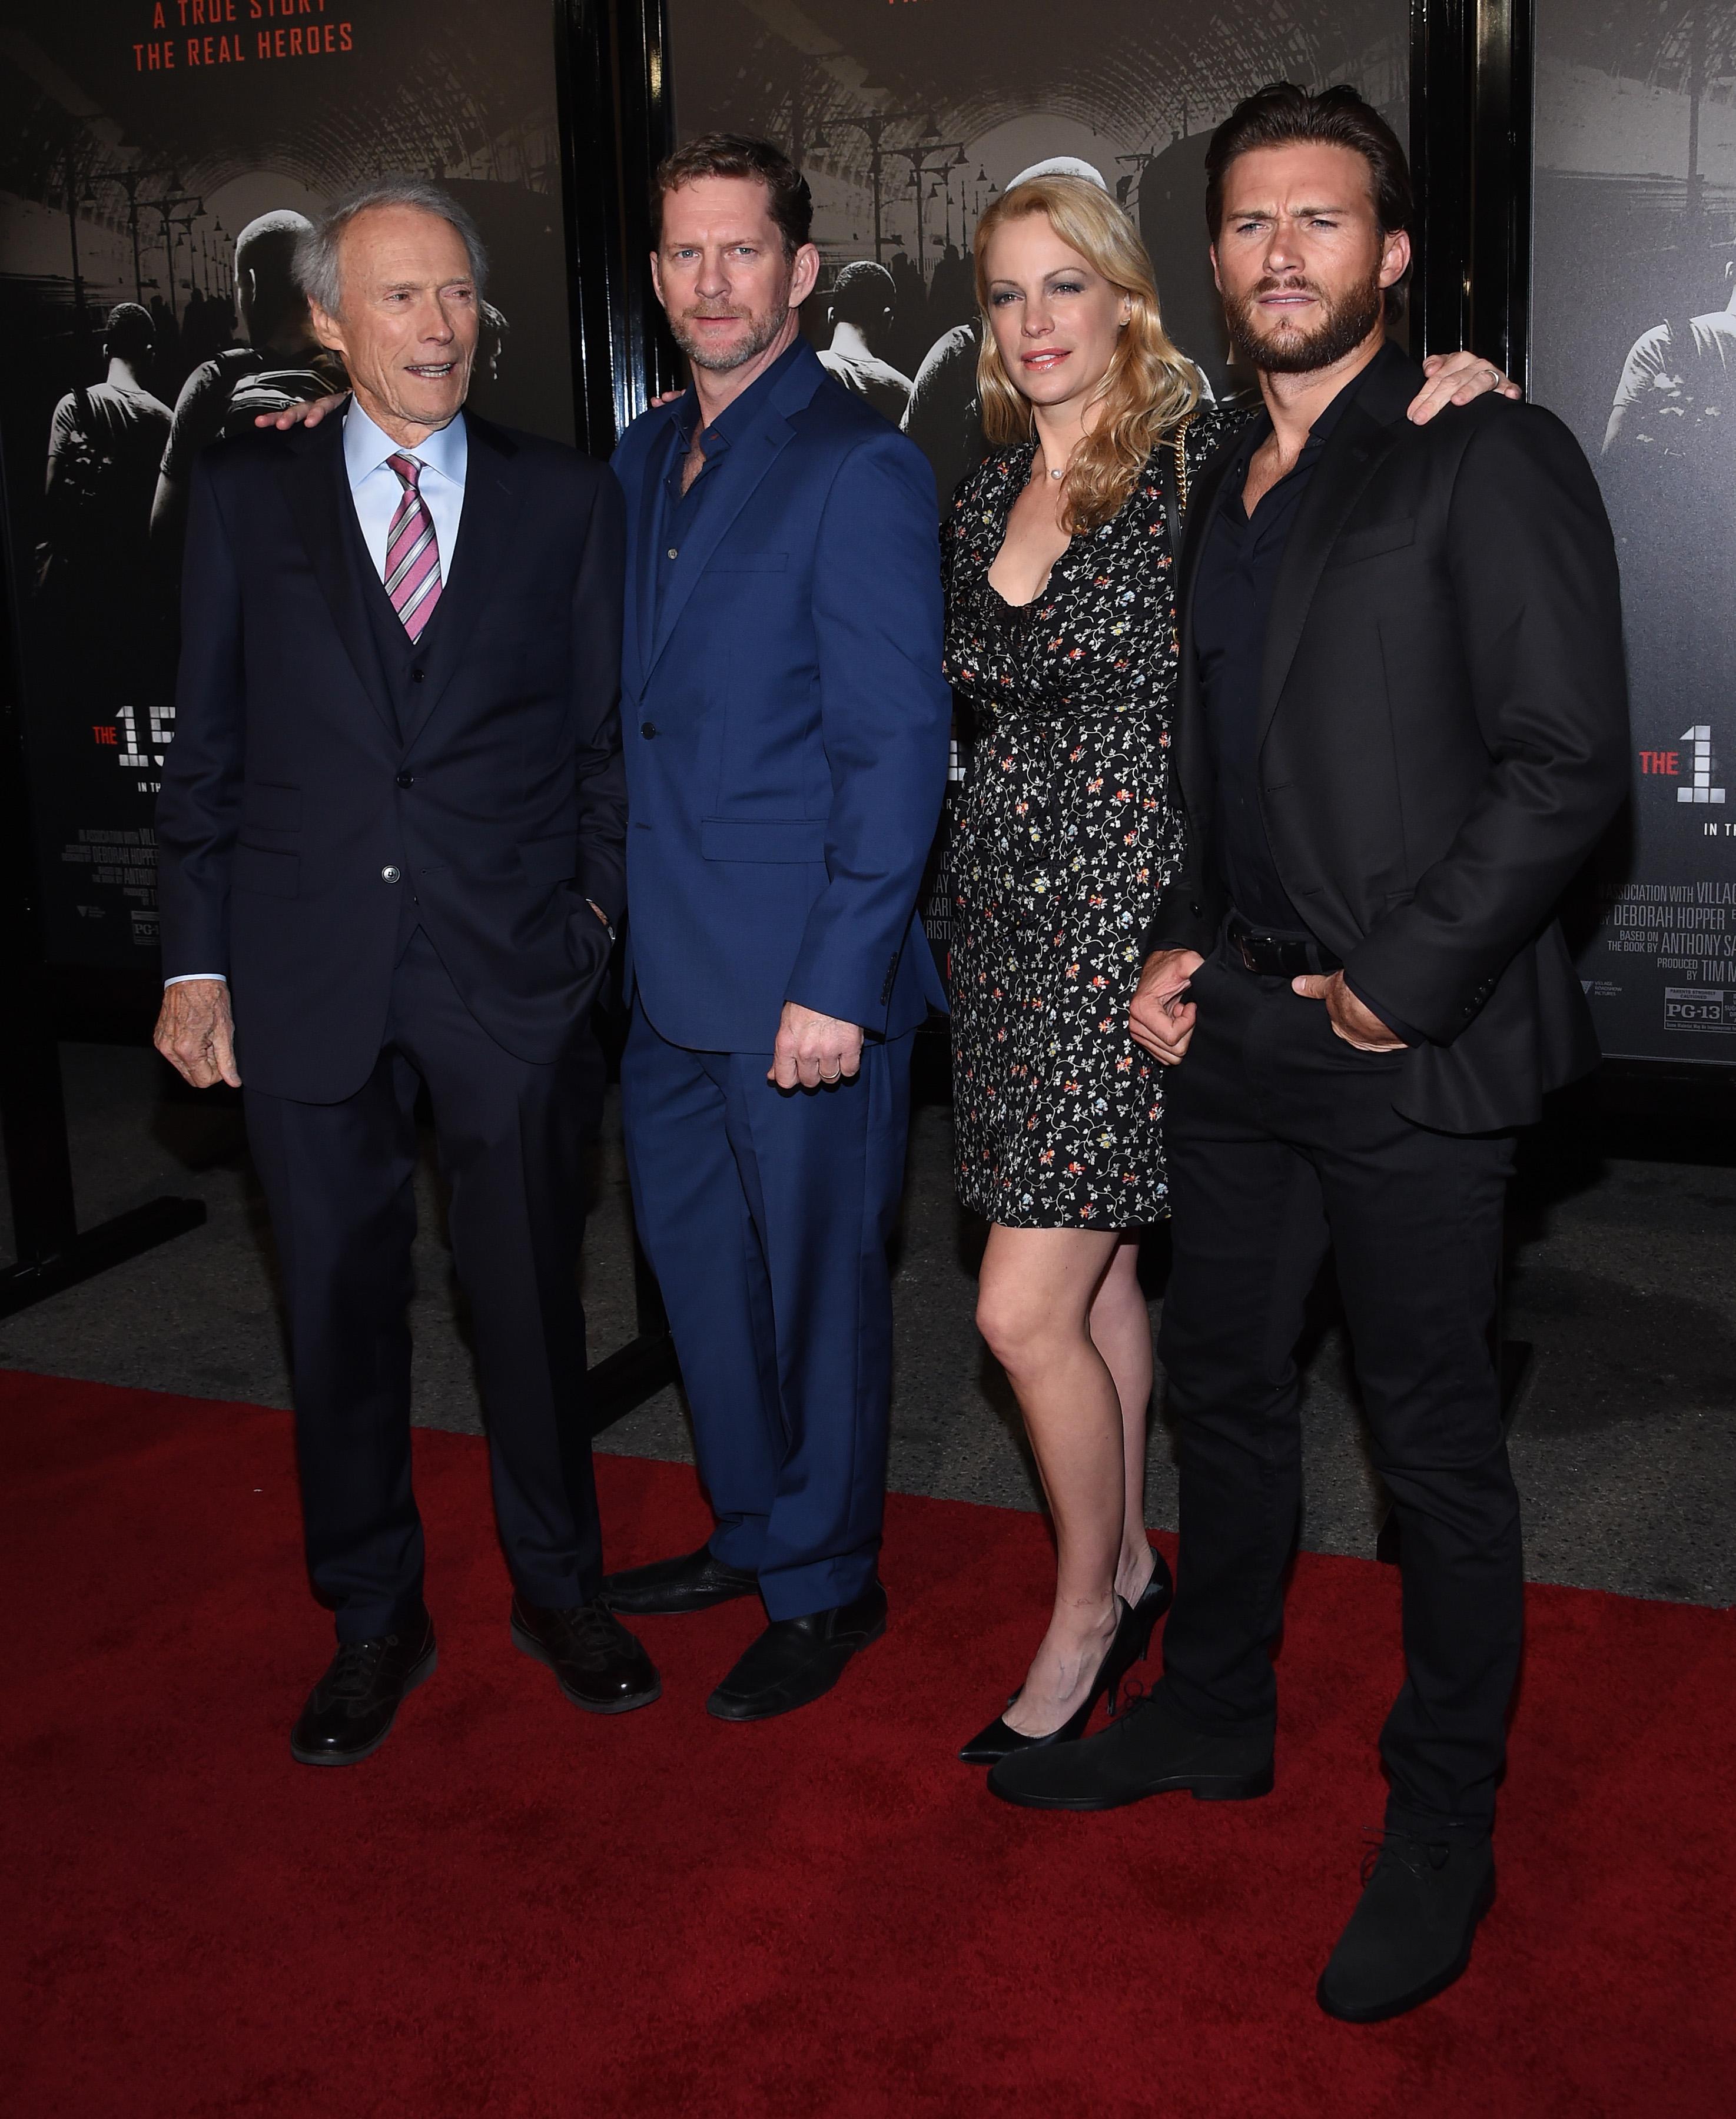 Clint Eastwood, Kyle Eastwood, Alison Eastwood, Scott Eastwood